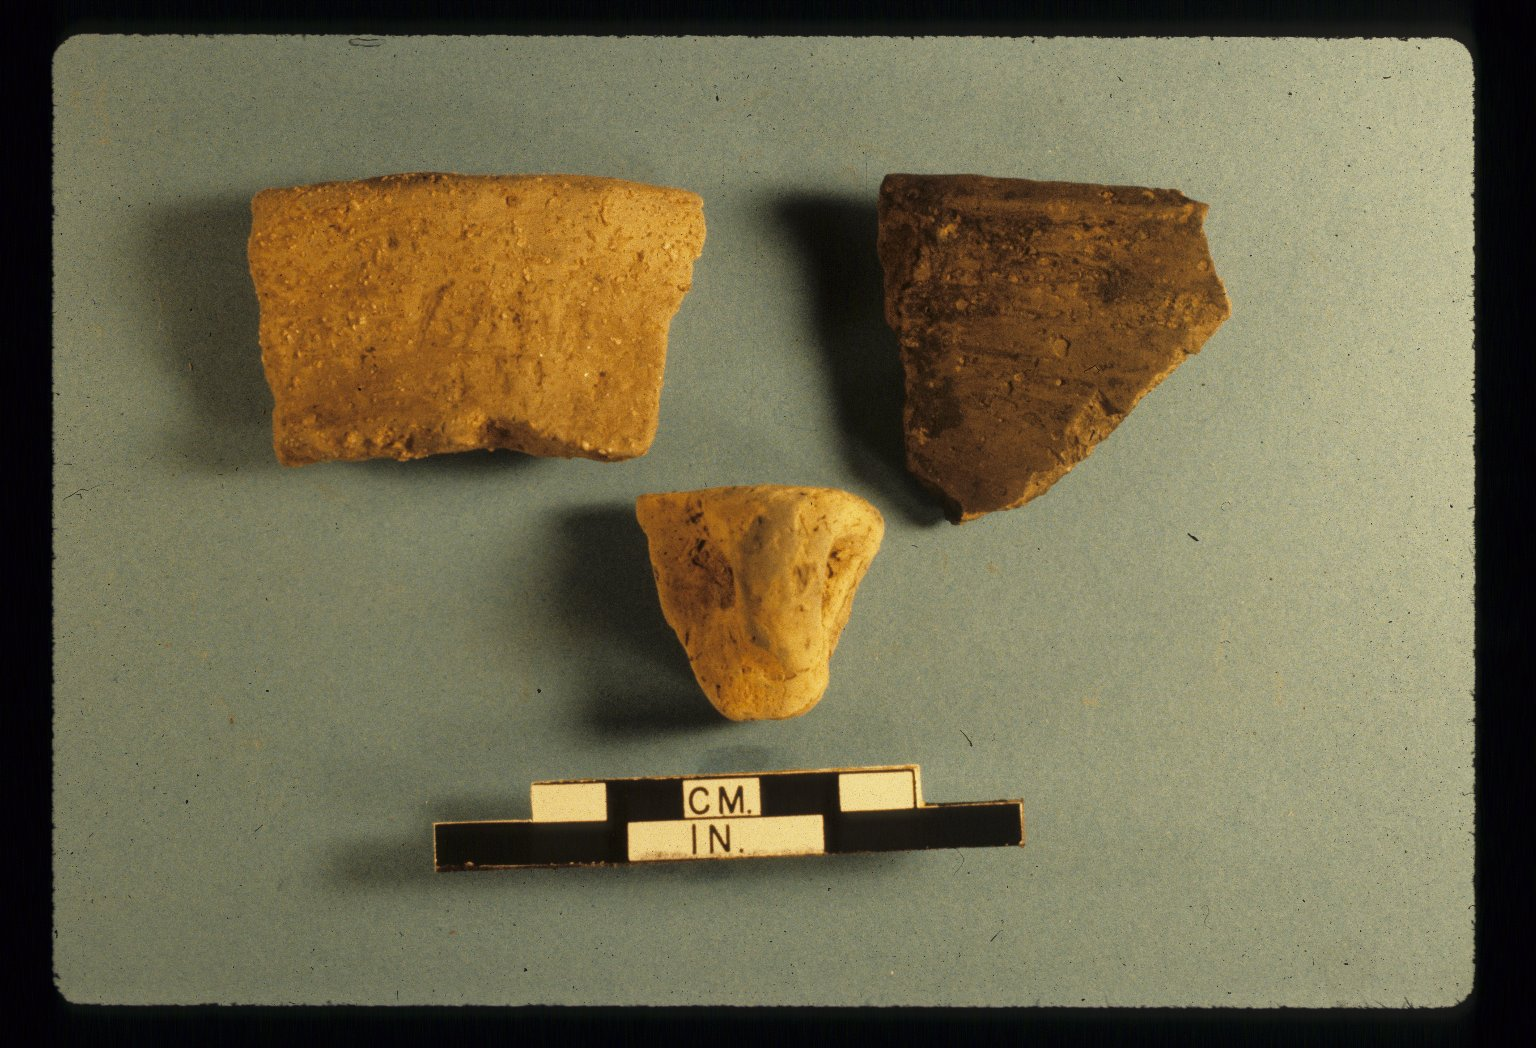 Rim sherds, Area 4, Zacharias site, 14LV380